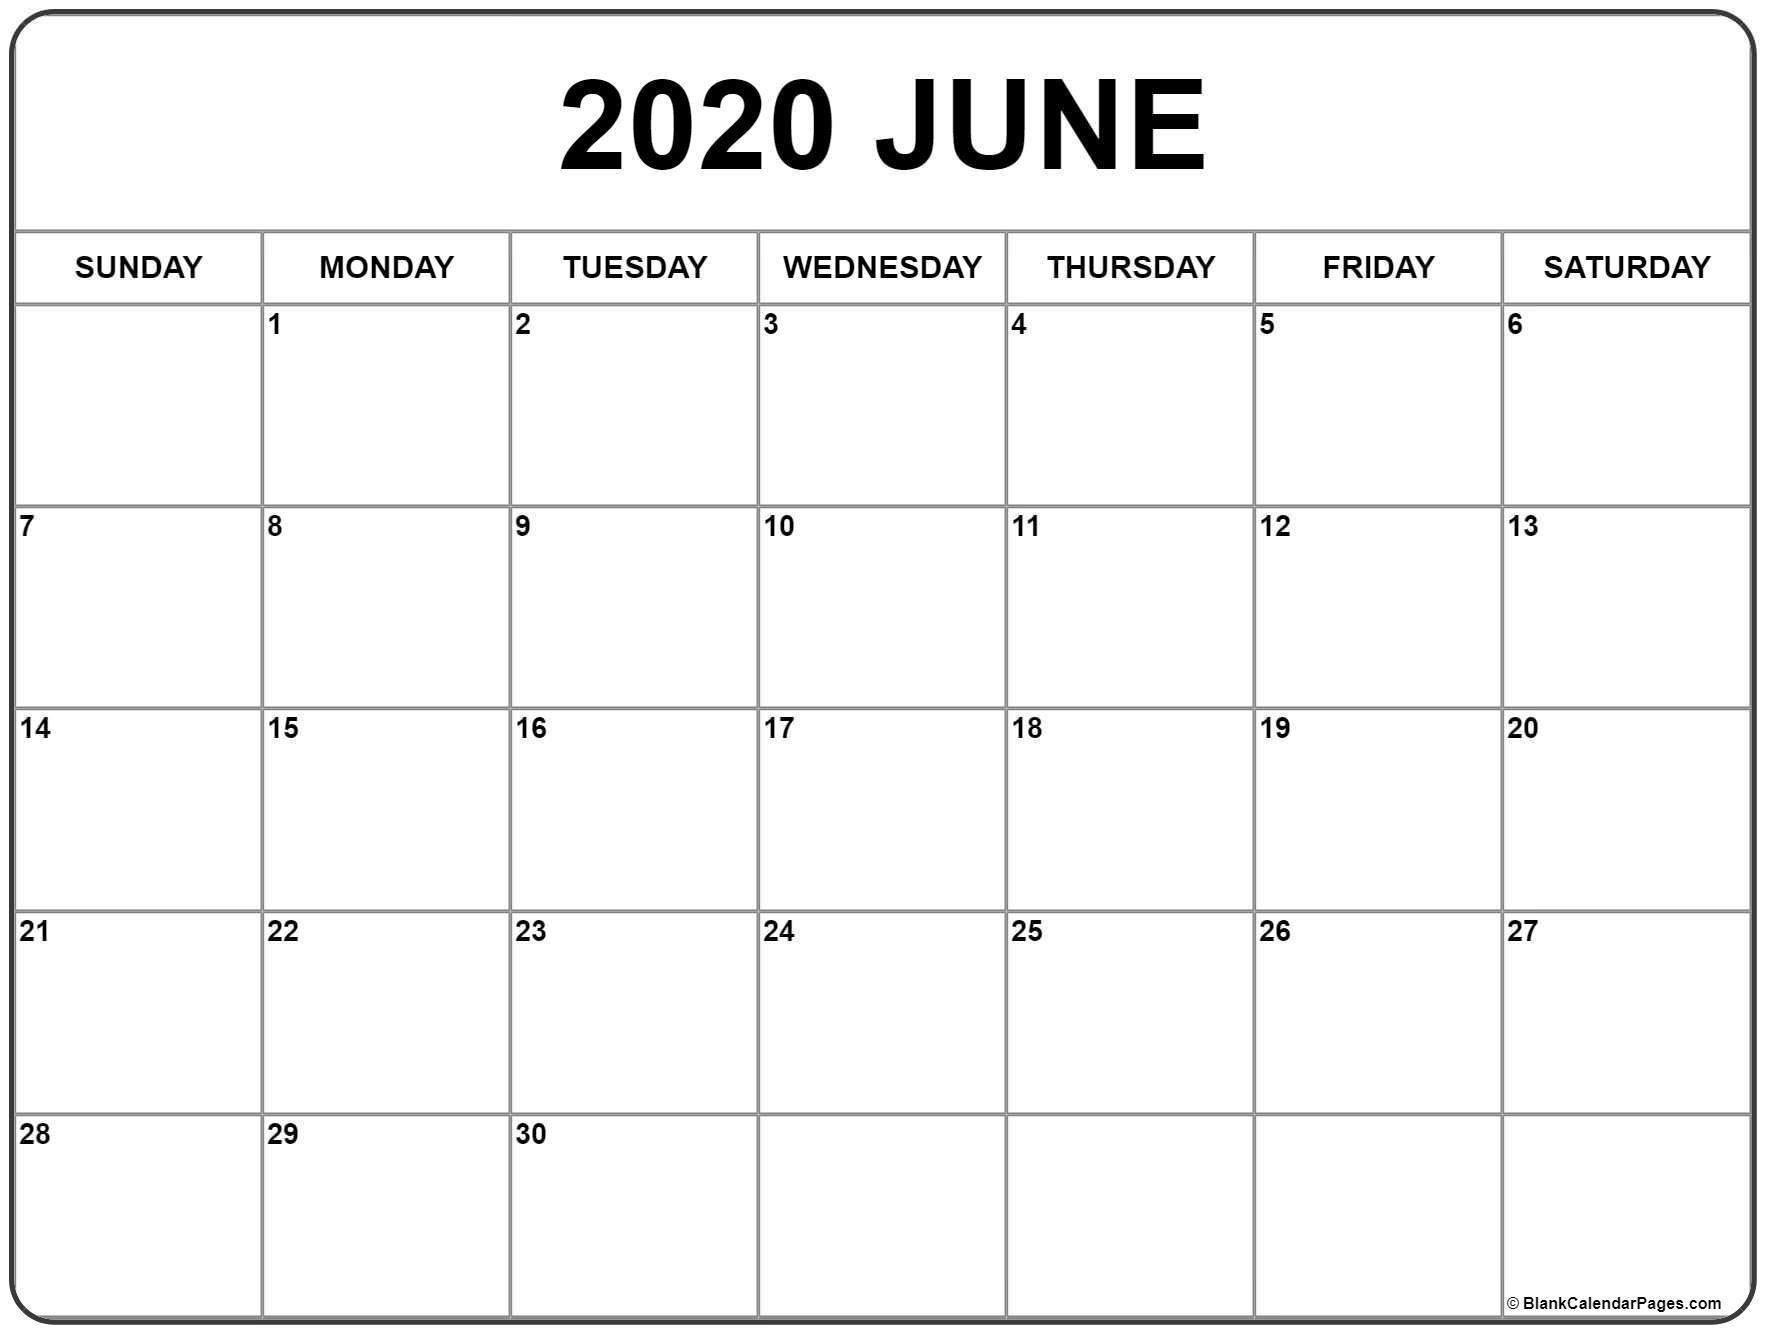 June 2020 Calendar | Free Printable Monthly Calendars in 2020 Calander To Write On